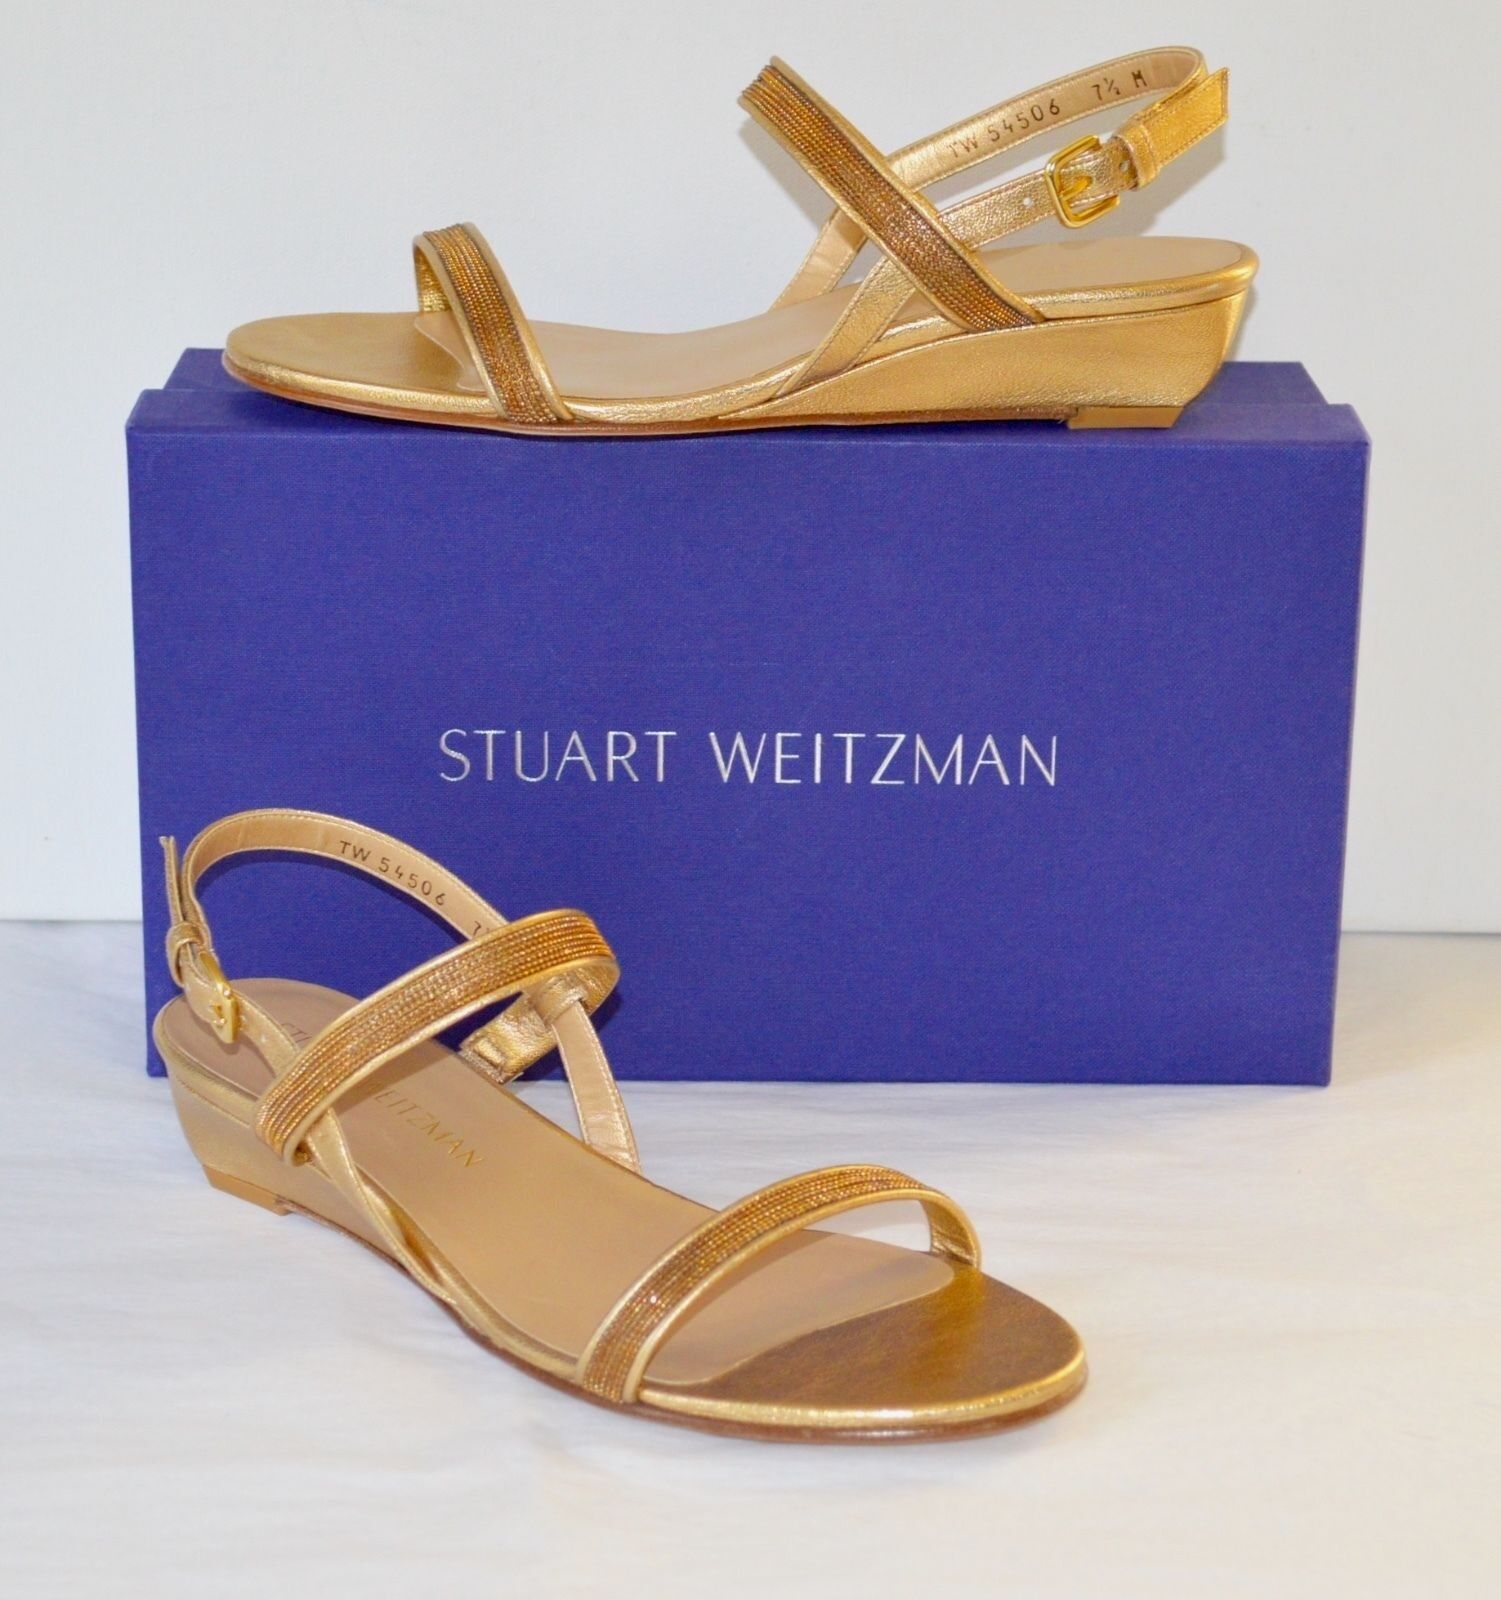 New $498 Nappa Stuart Weitzman InChains In Chains Chino Washed Nappa $498 Leather Wedge 8 3a4083